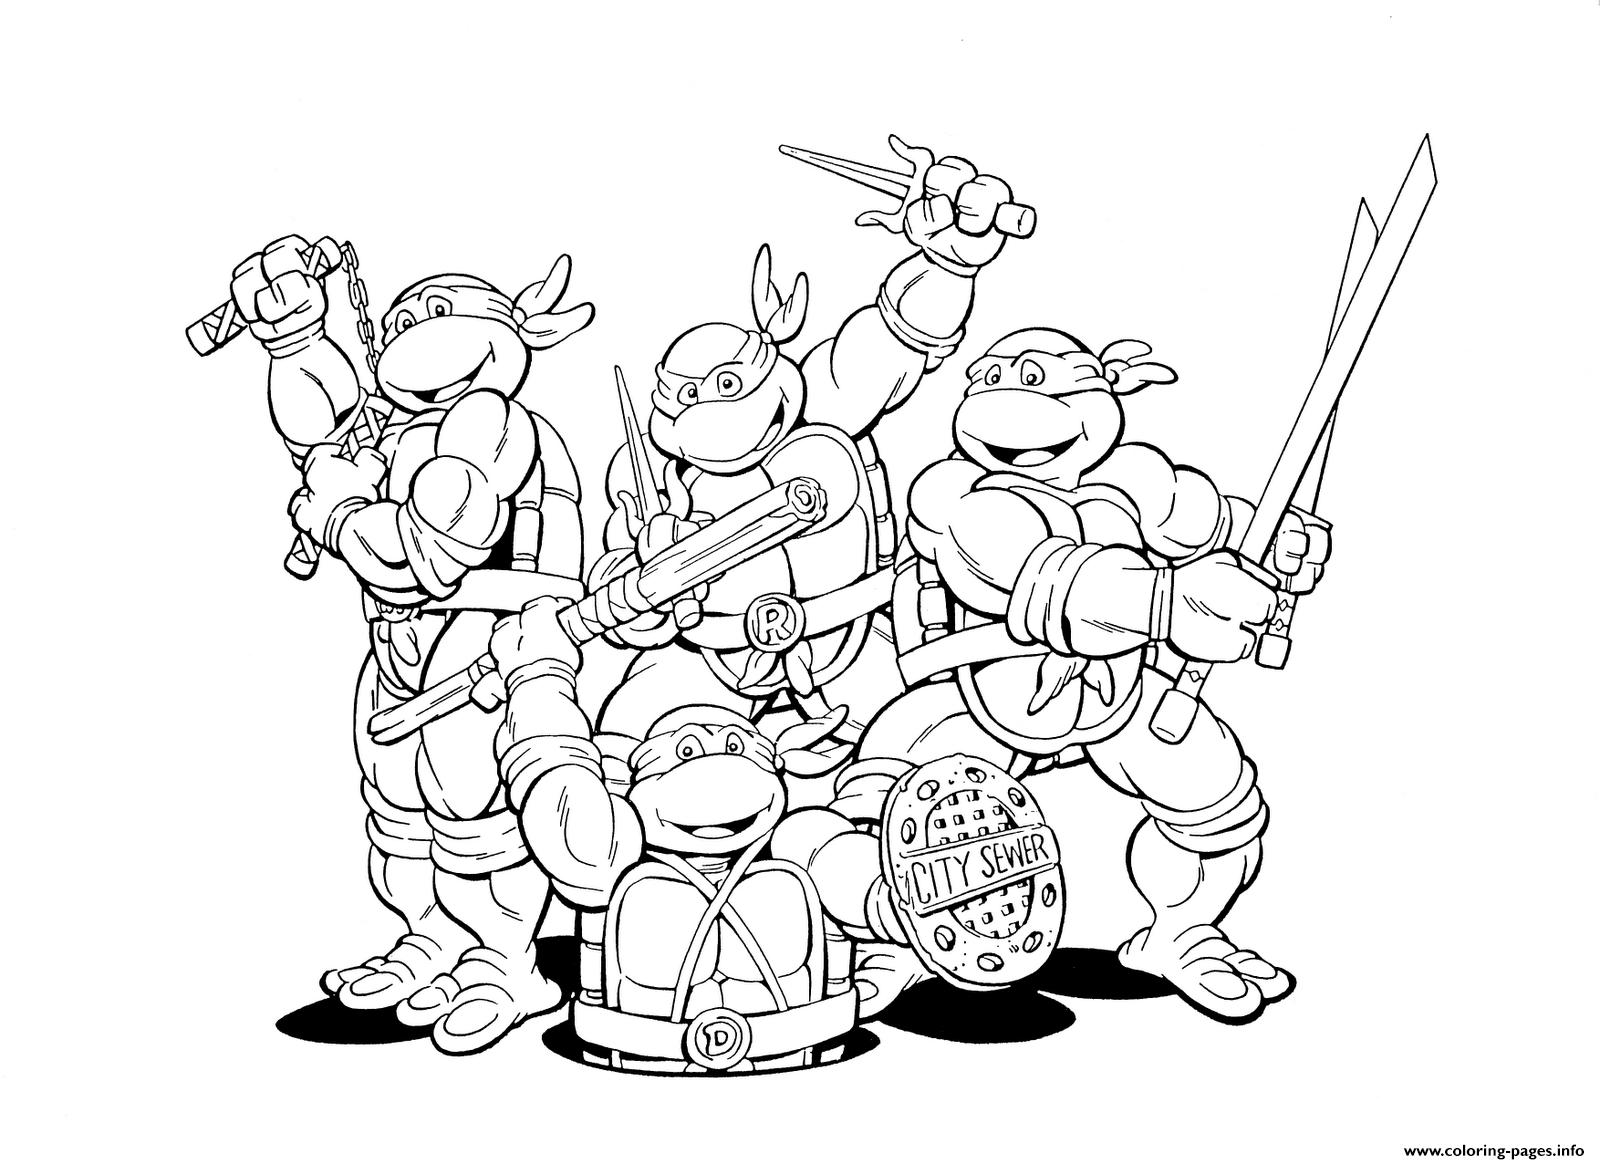 Free coloring pages superheroes printable - Kids Ninja Turtles Free Superhero S032b Coloring Pages